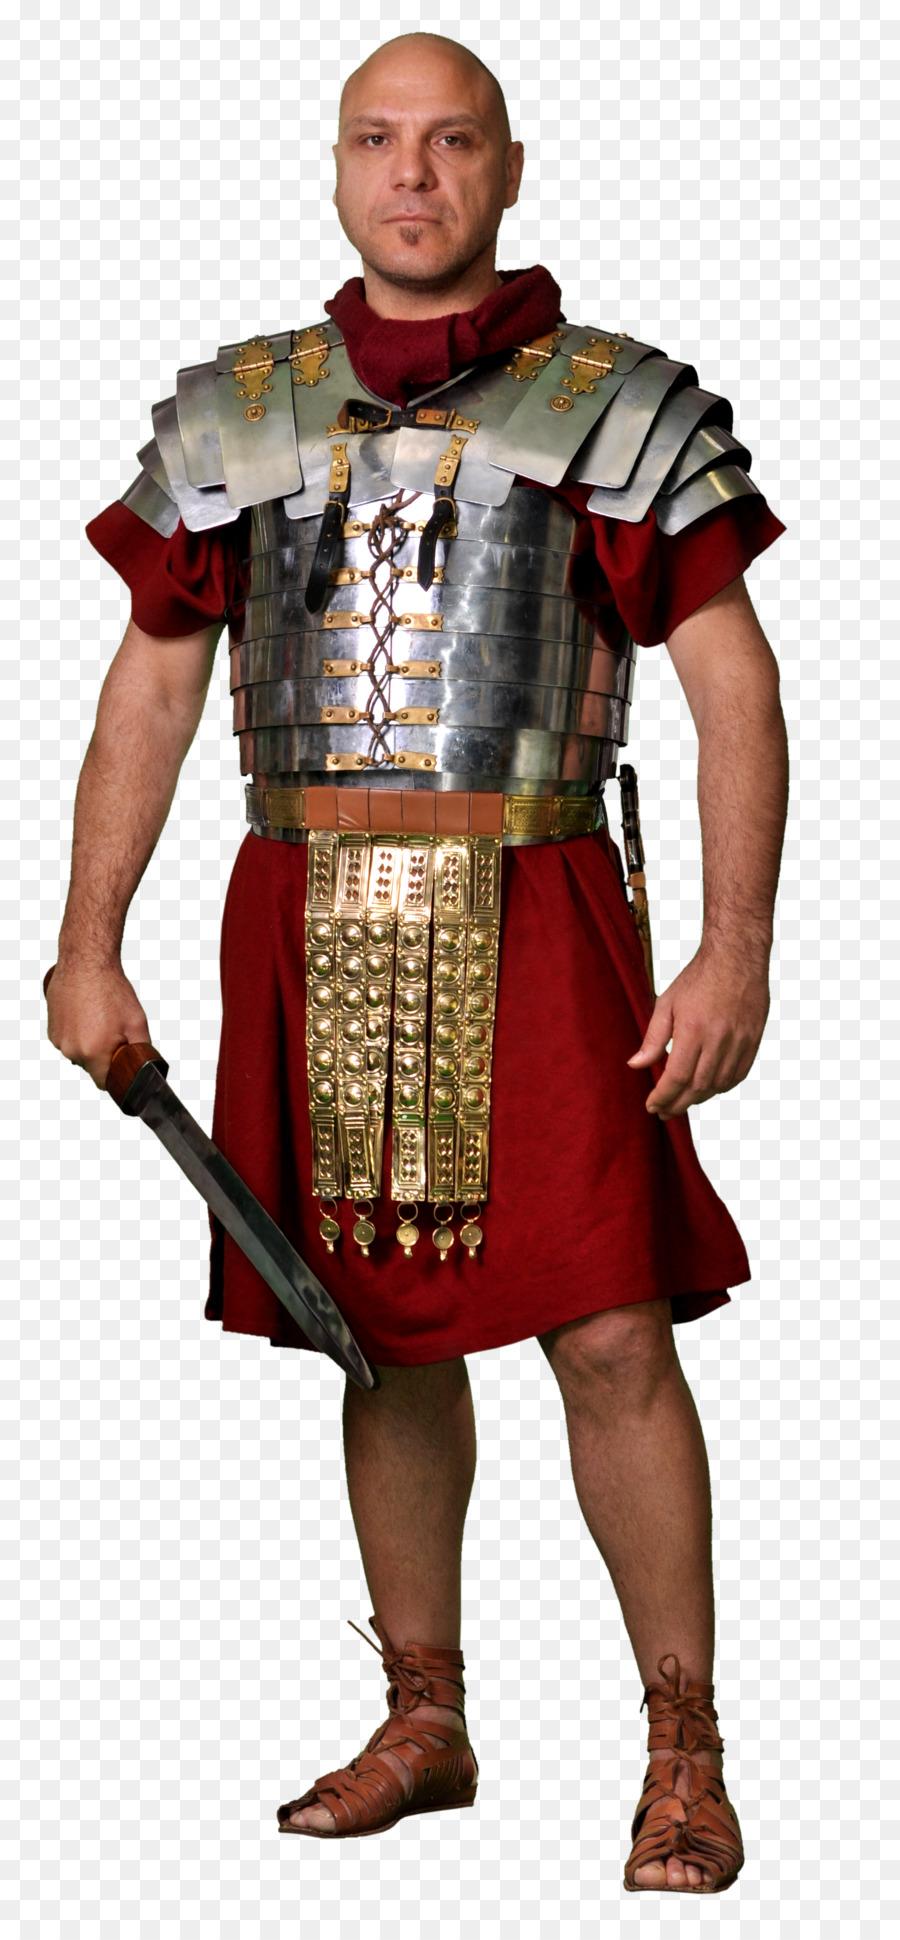 Картинки римский воин в доспехах